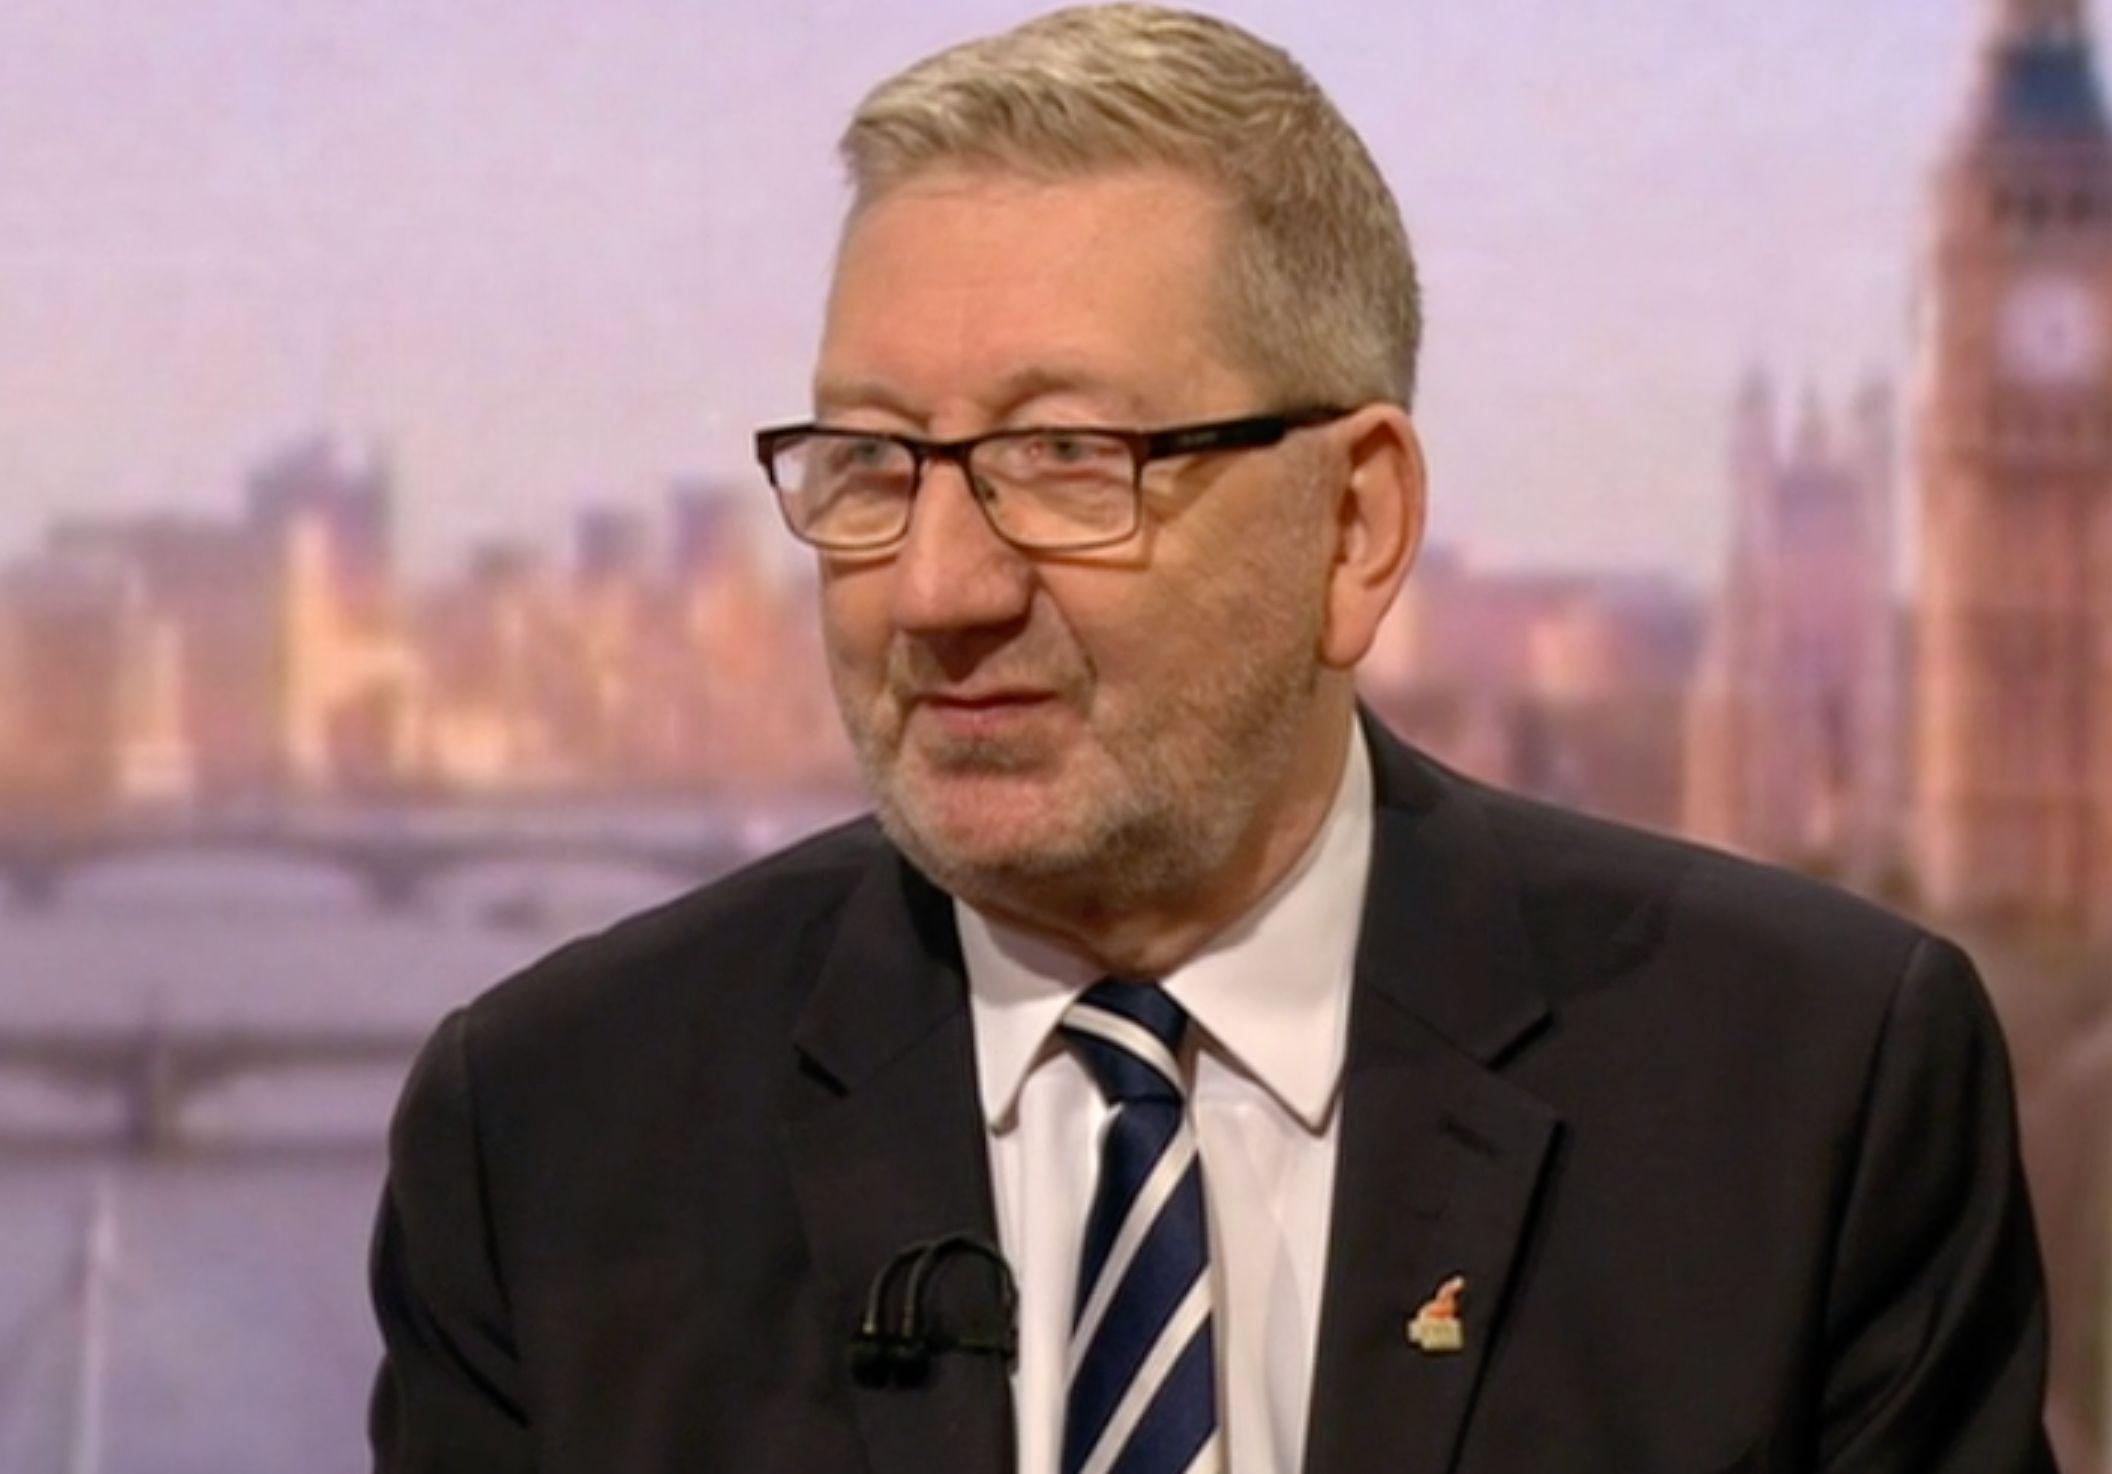 Anti-Semitism Accusations Used To Undermine Jeremy Corbyn, Says Len McCluskey